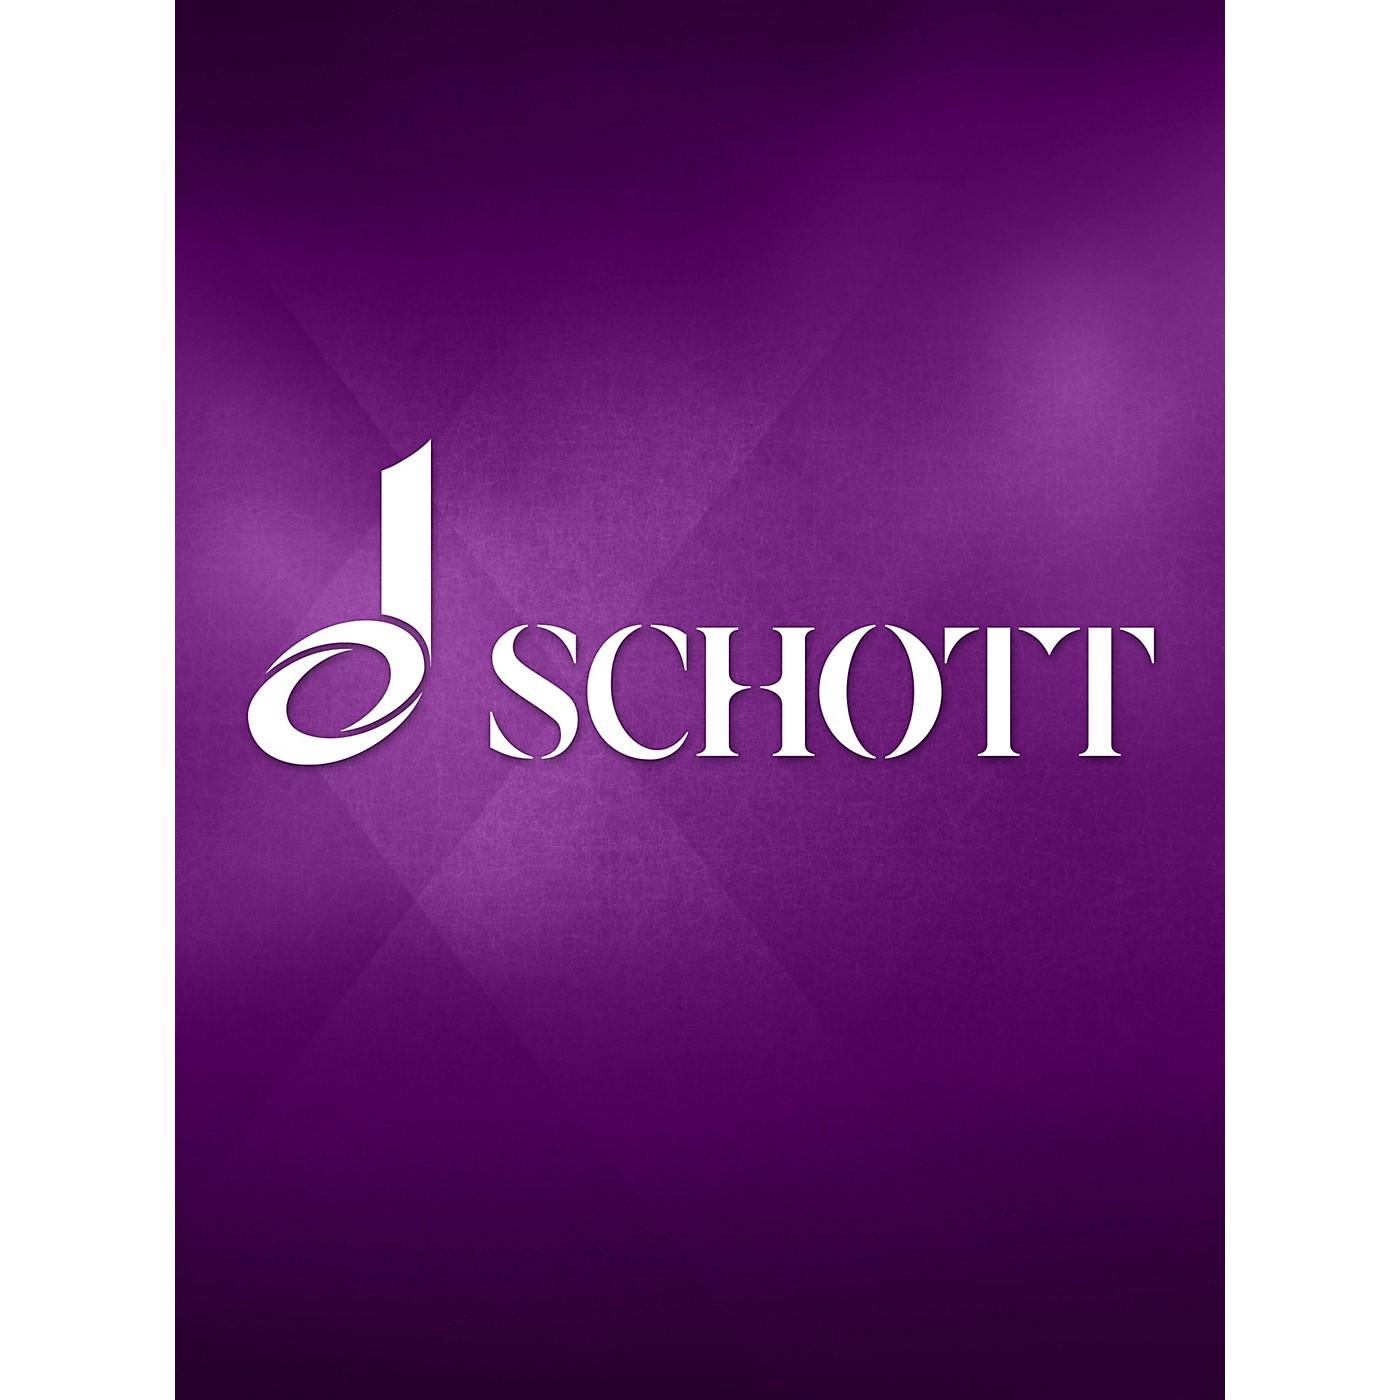 Schott Hispanae Citharae Ars Viva (Anthology of Guitar Music from Old Tabulatures) Schott Series thumbnail